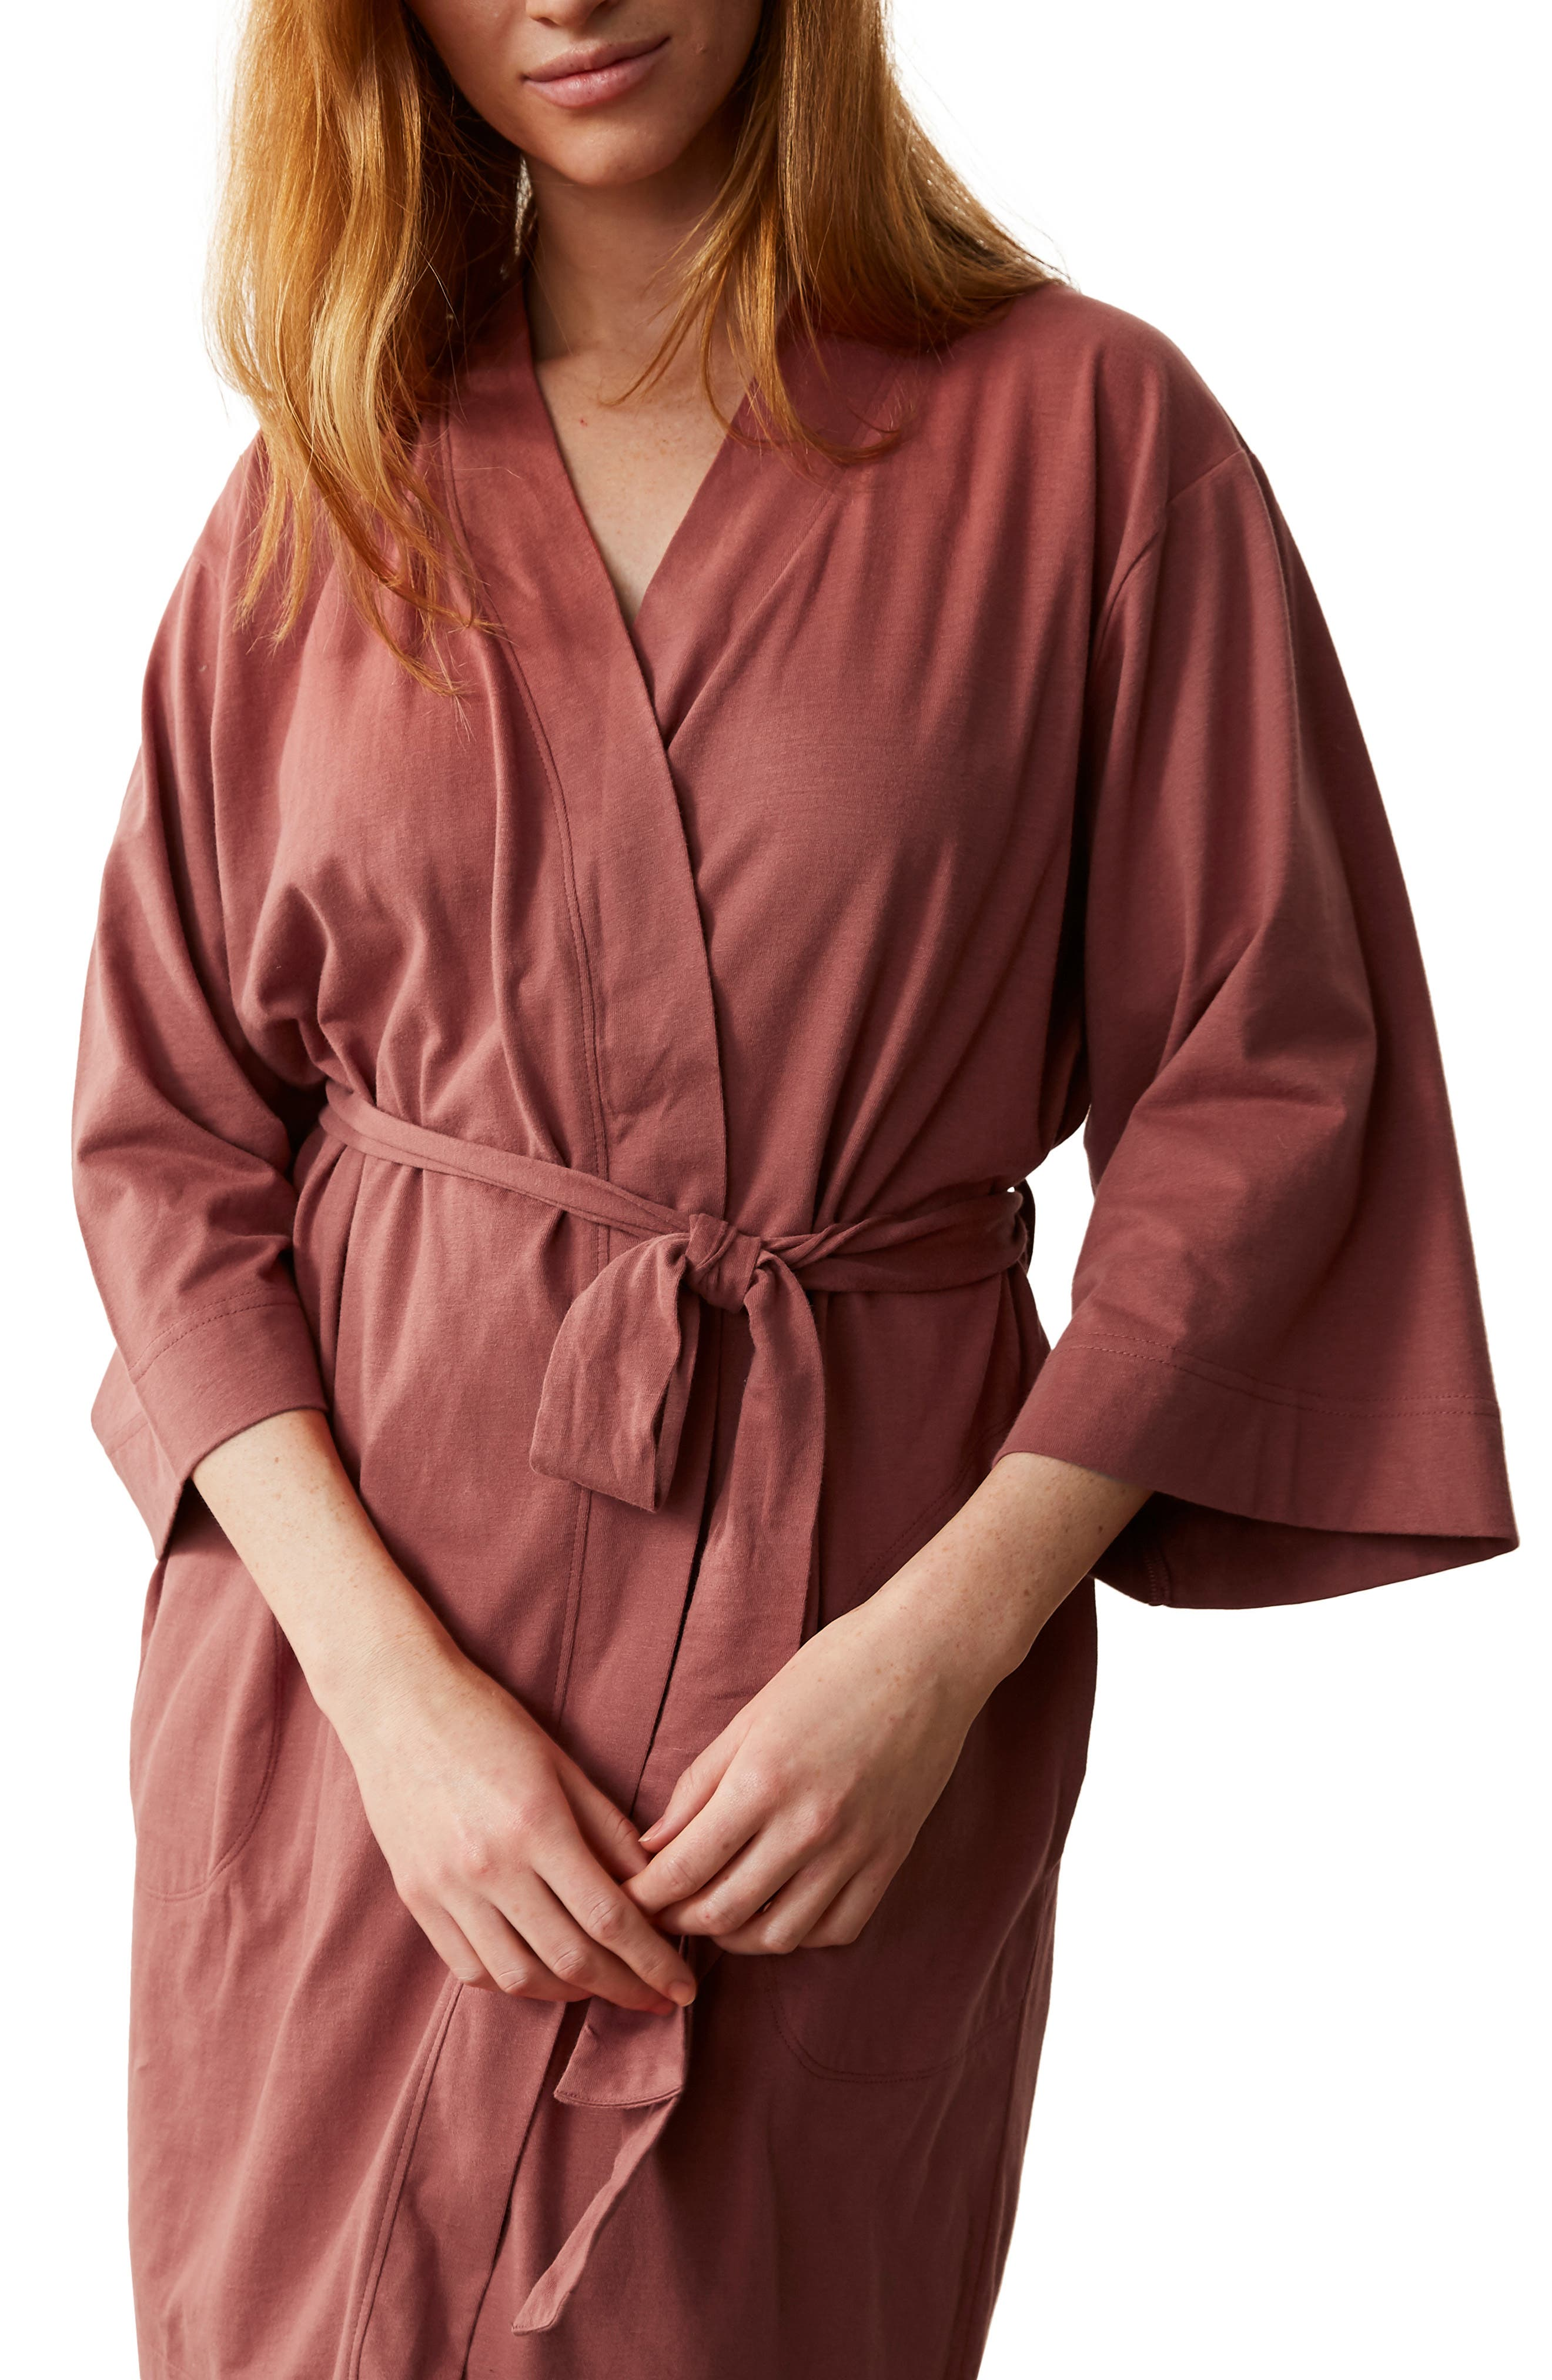 Solstice Organic Cotton Jersey Robe